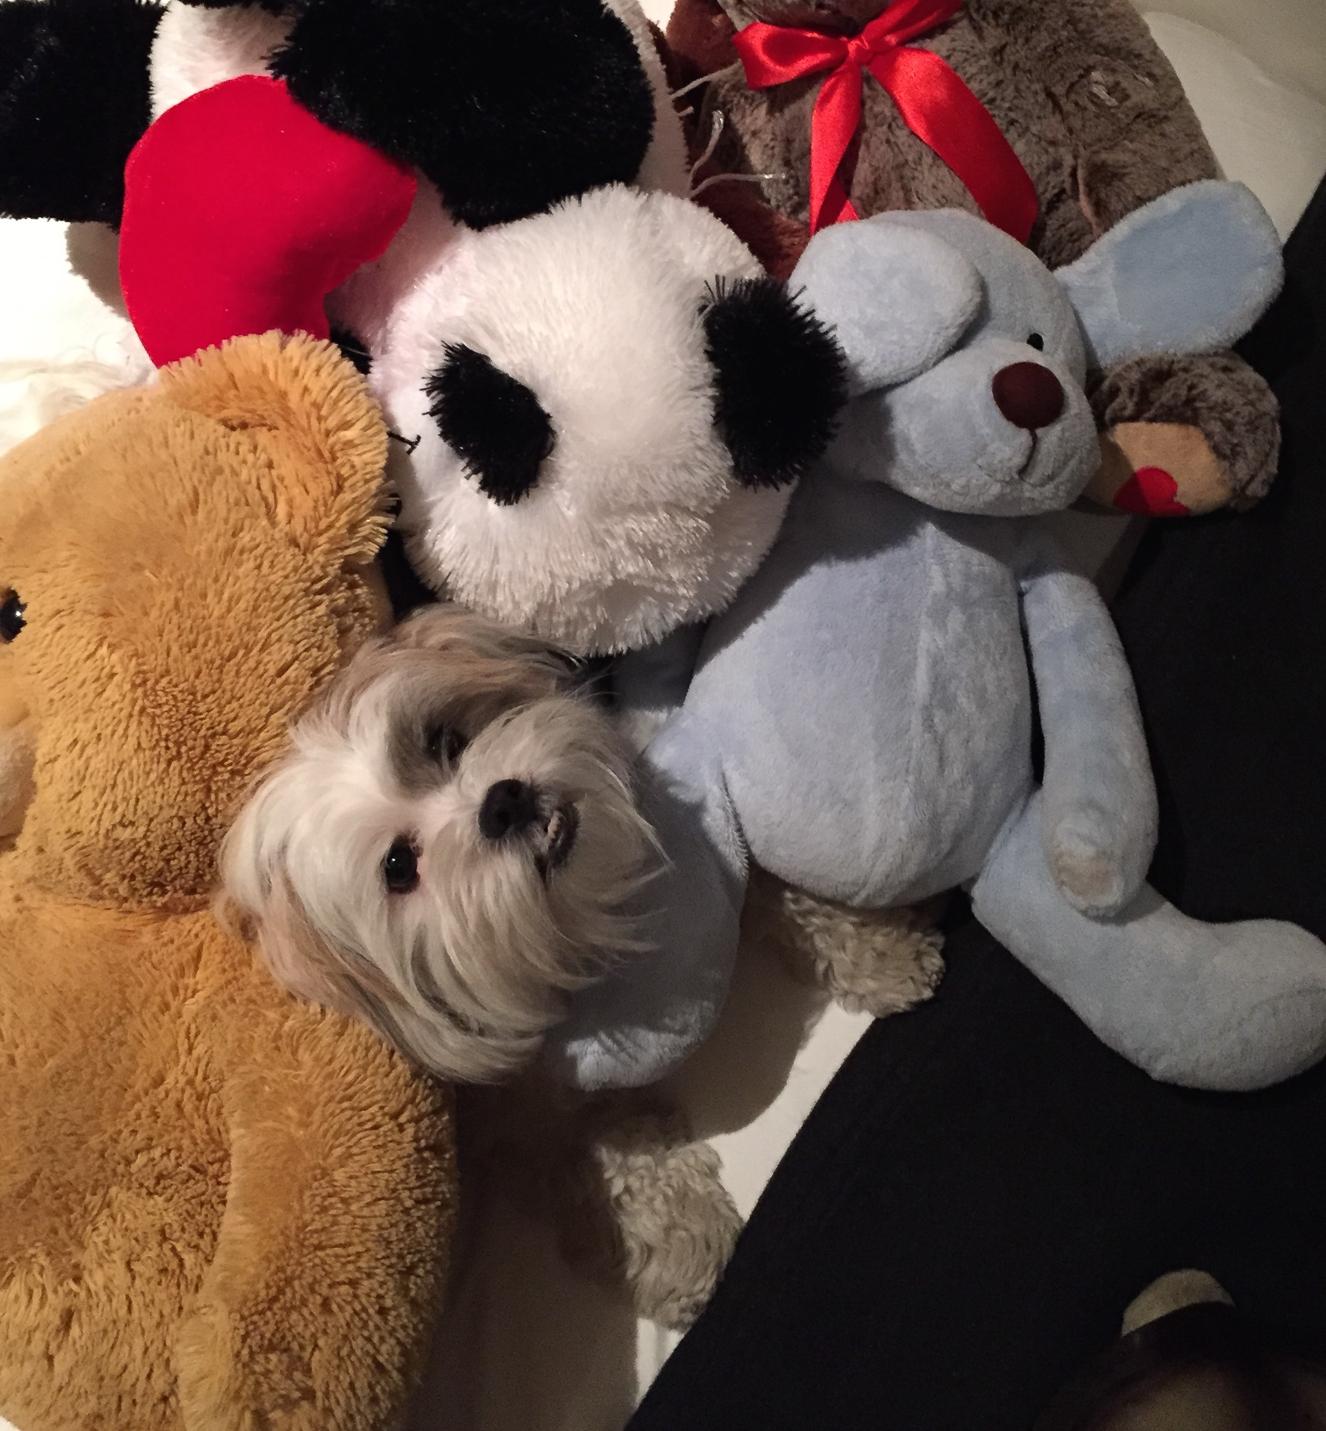 Where's Teddy? Manhattan, New York 2015 (M)